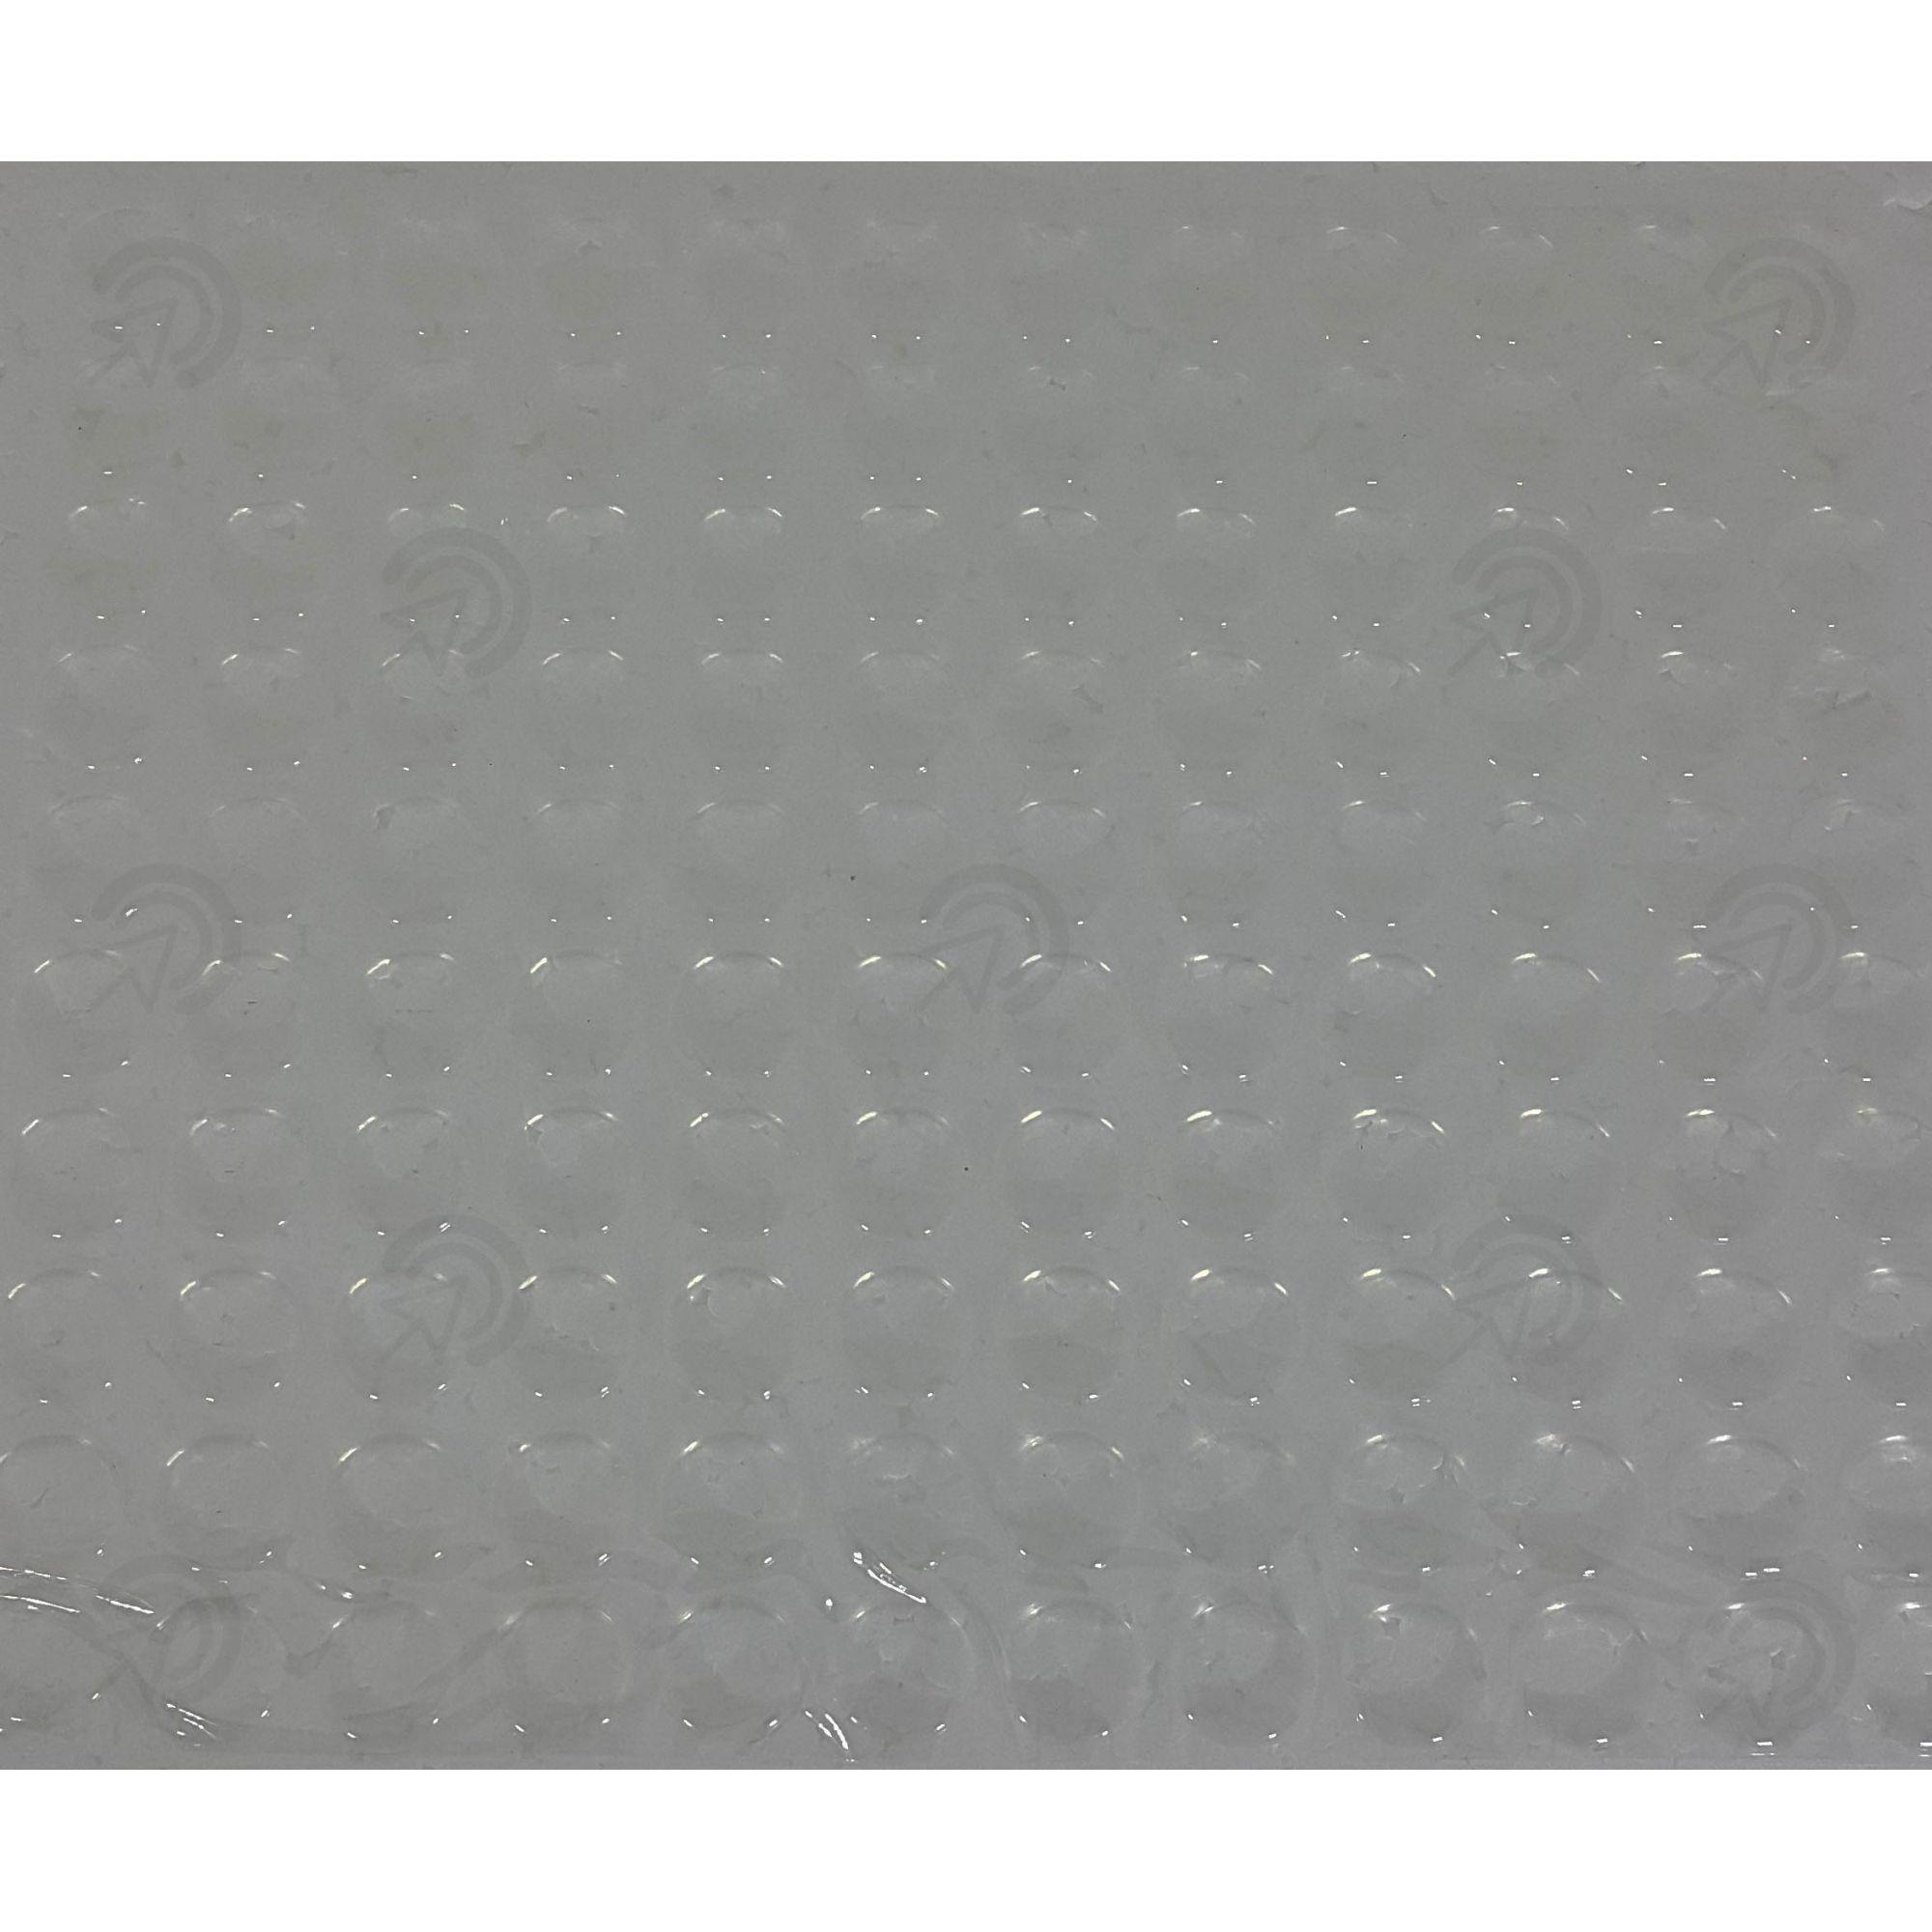 Protetor Batente De Silicone Redondo 12mm Multiuso Com Cola (gotas De Silicone)